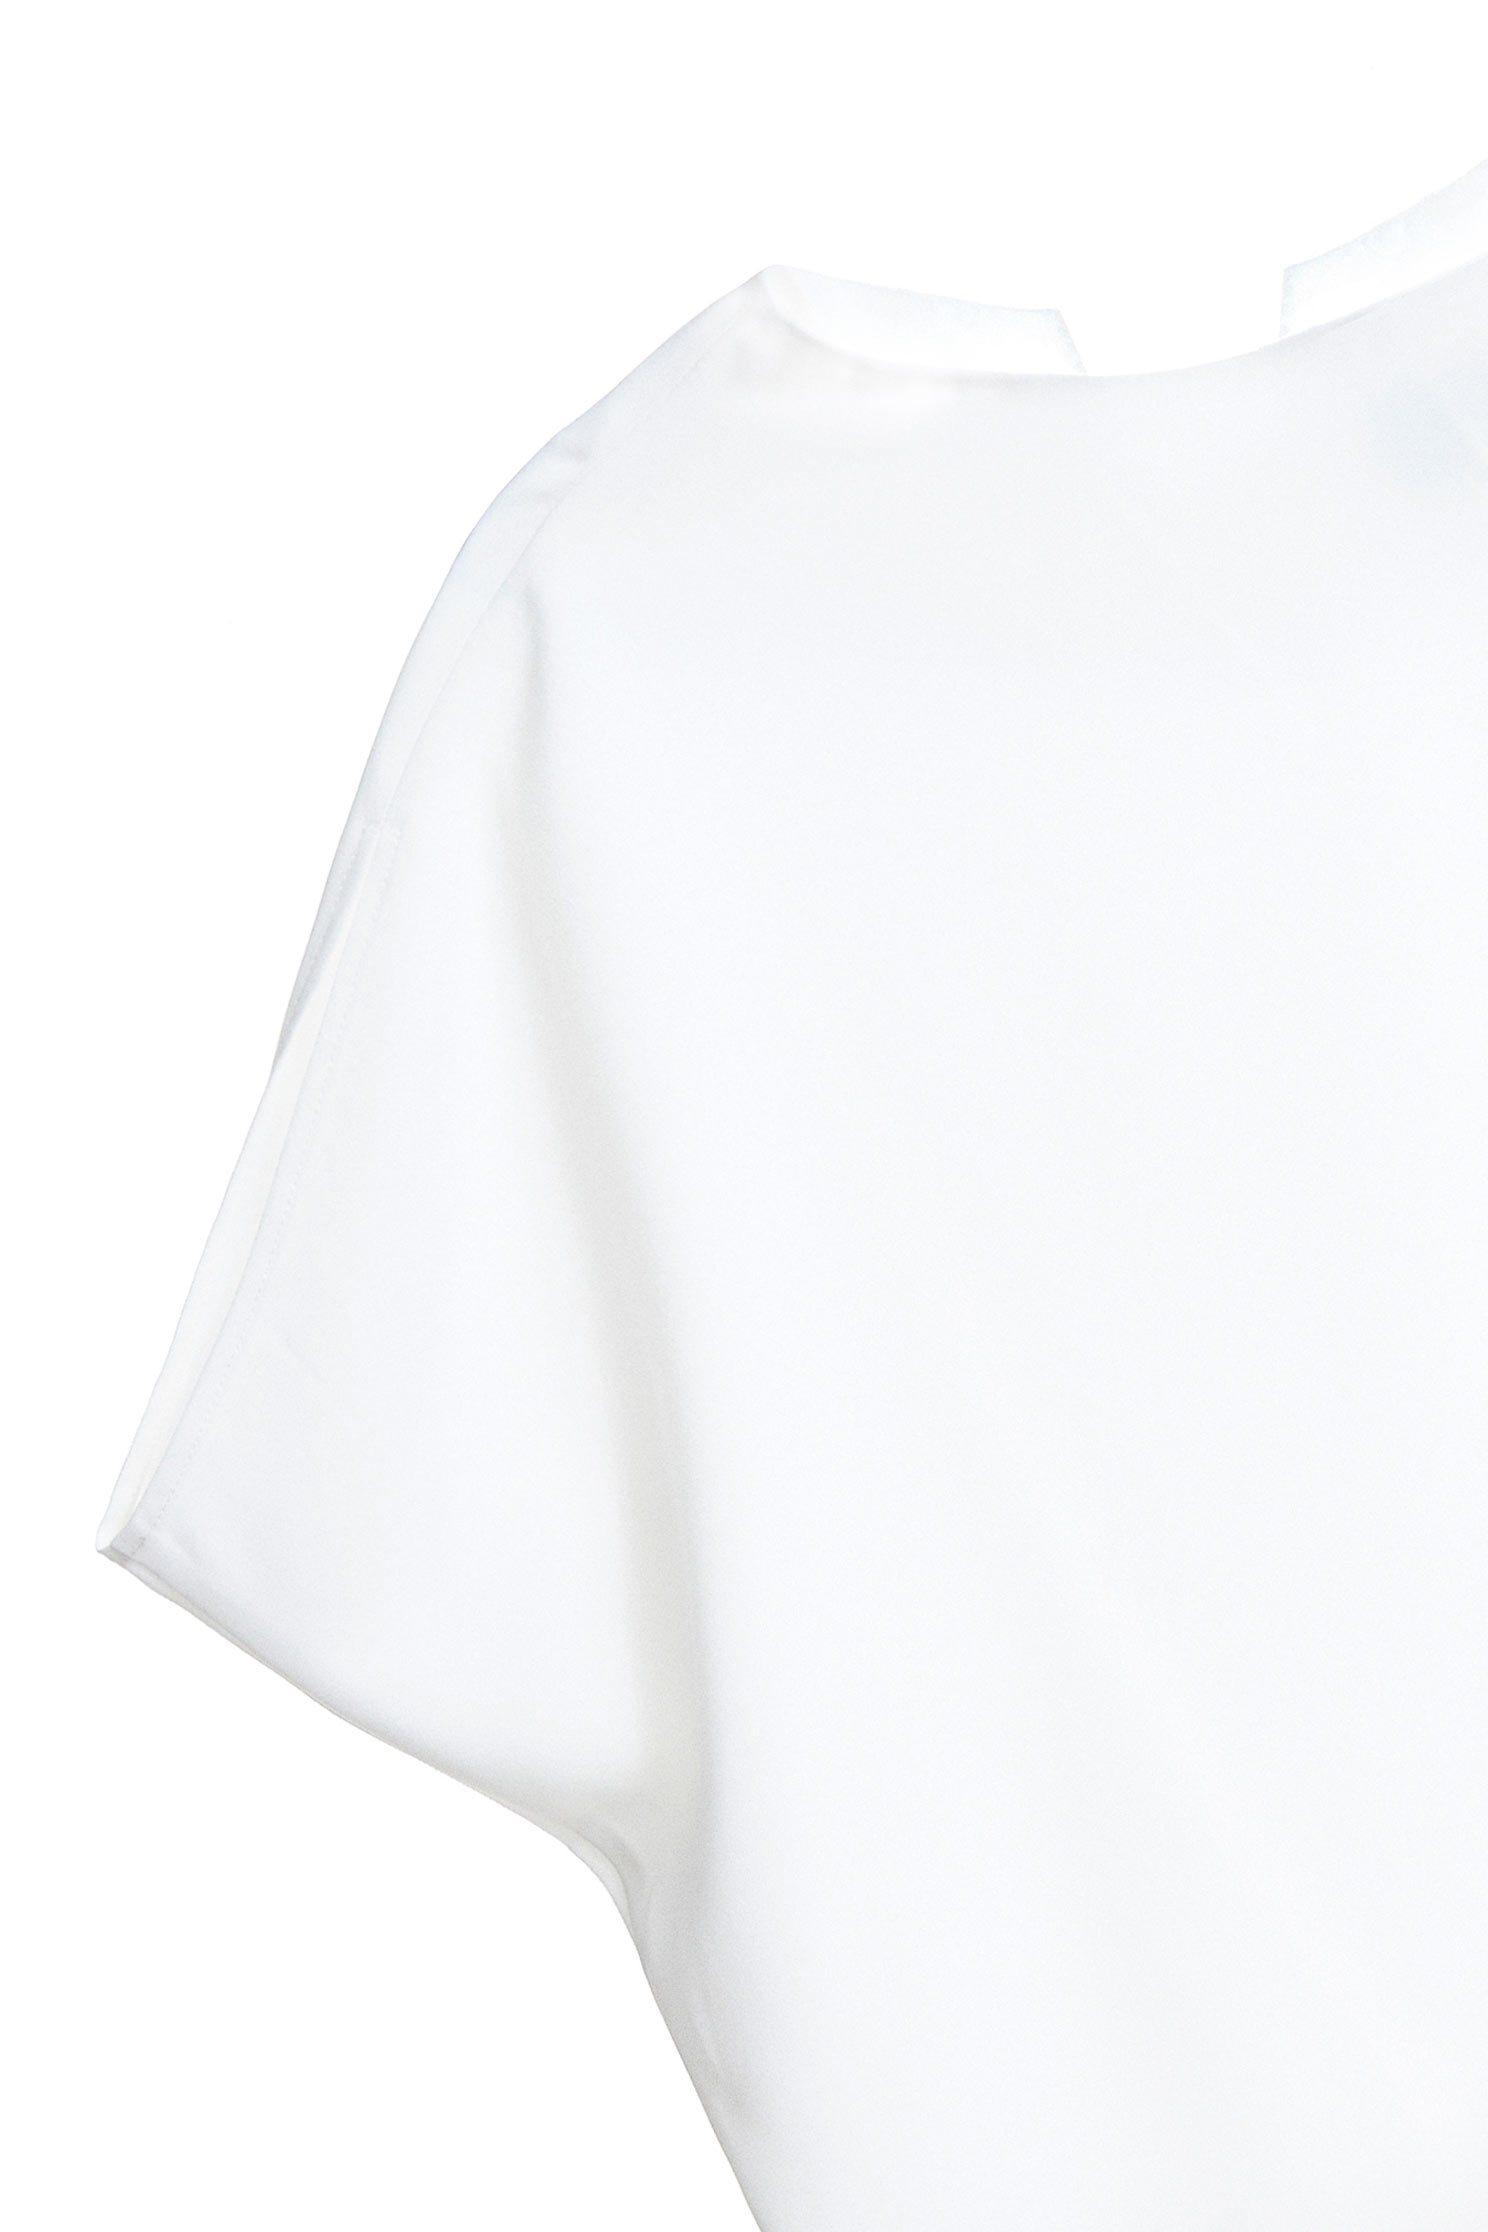 Elegant classic top,Top,白色上衣